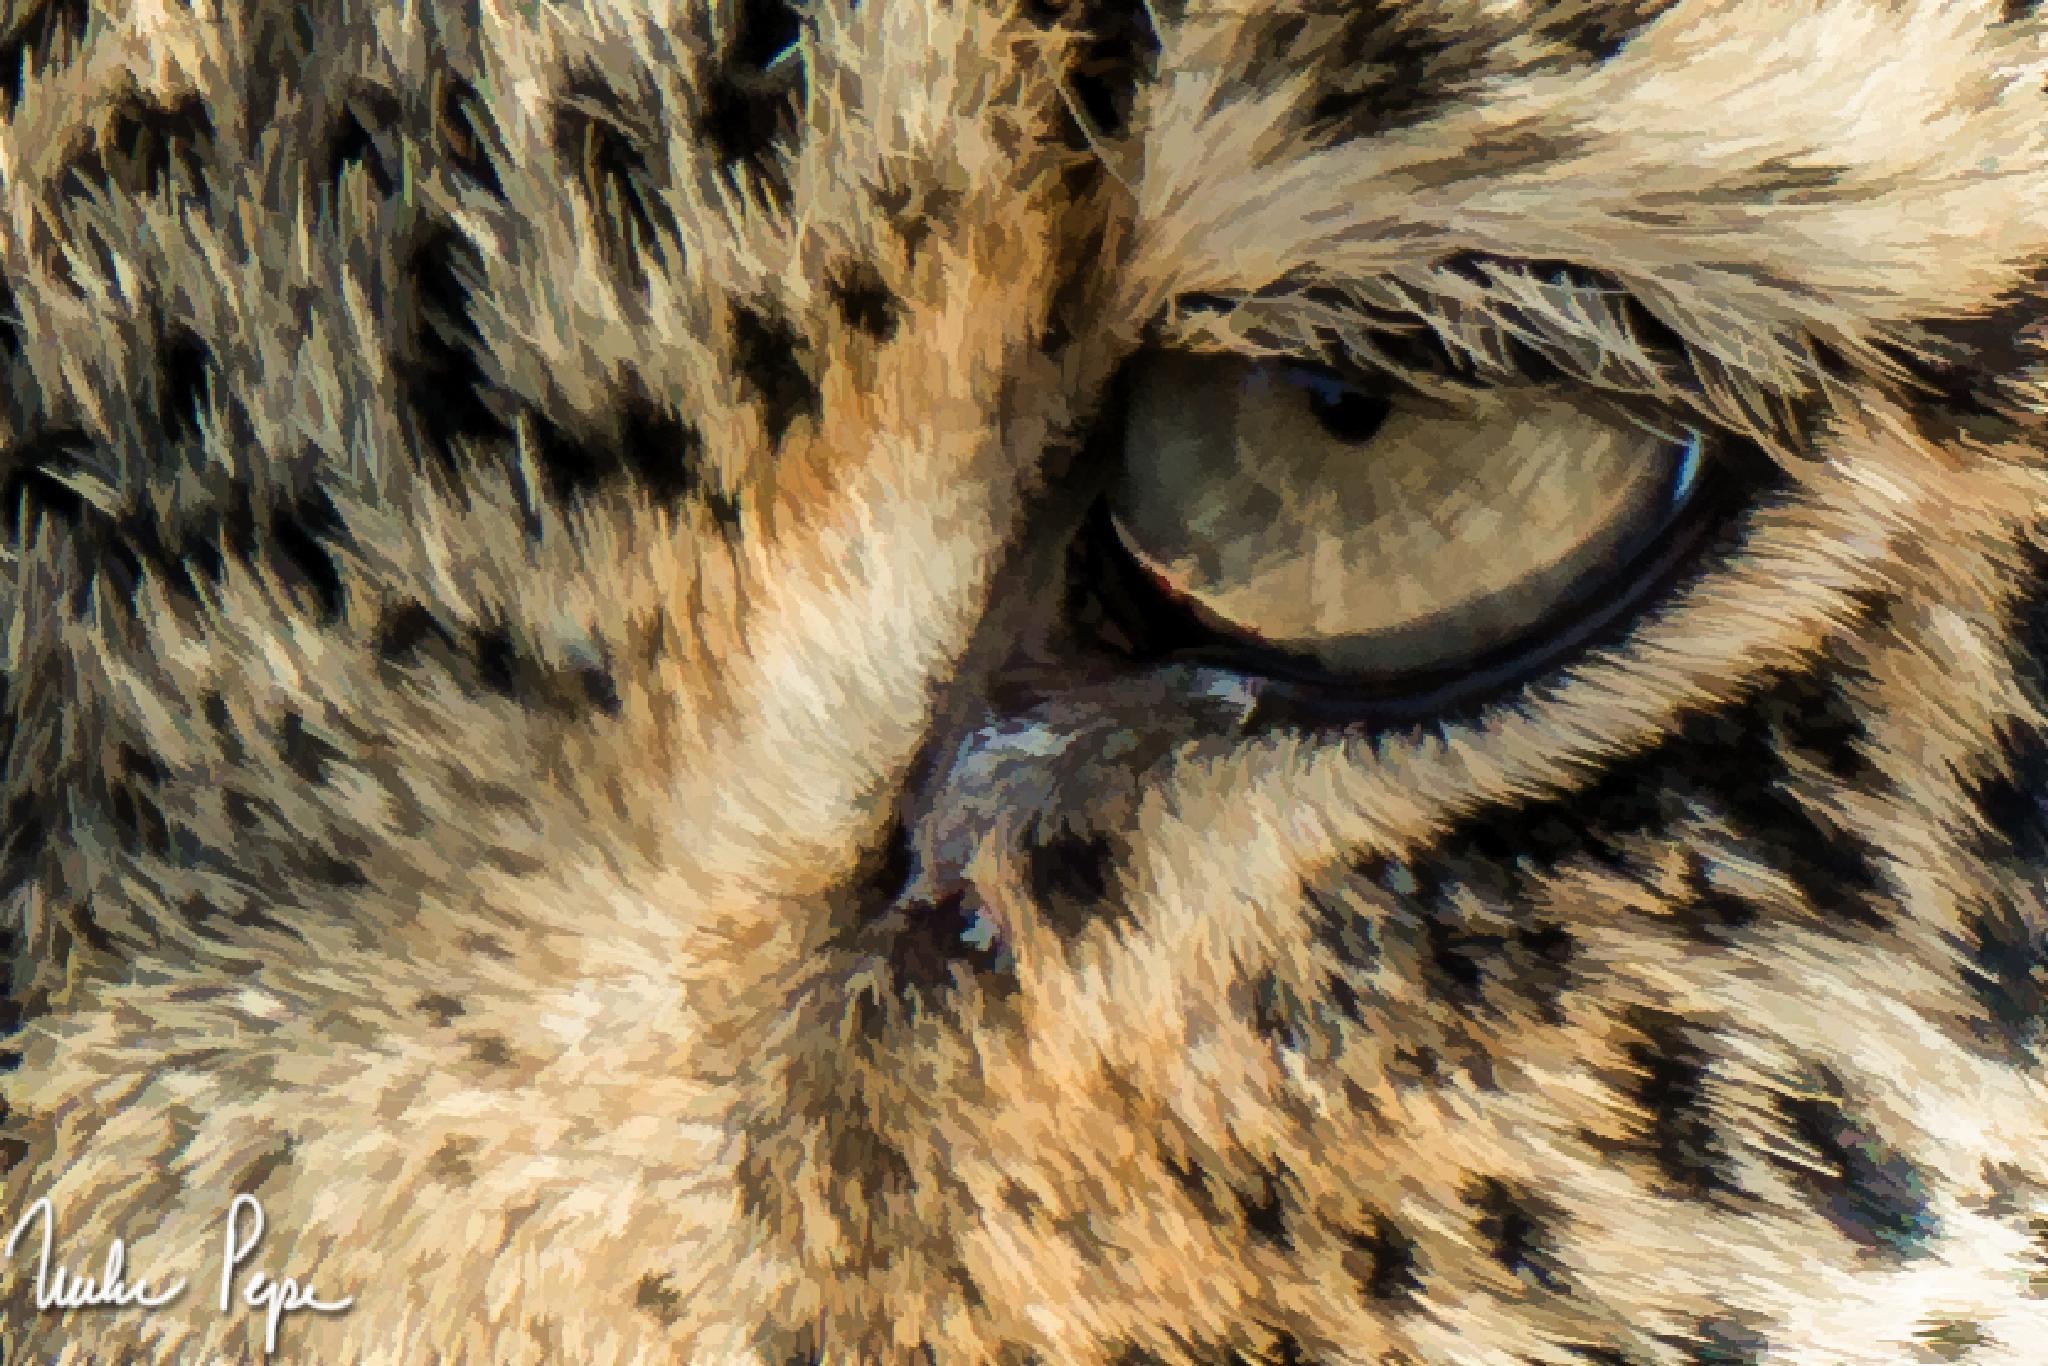 Leopard Eye by Mike Pepe